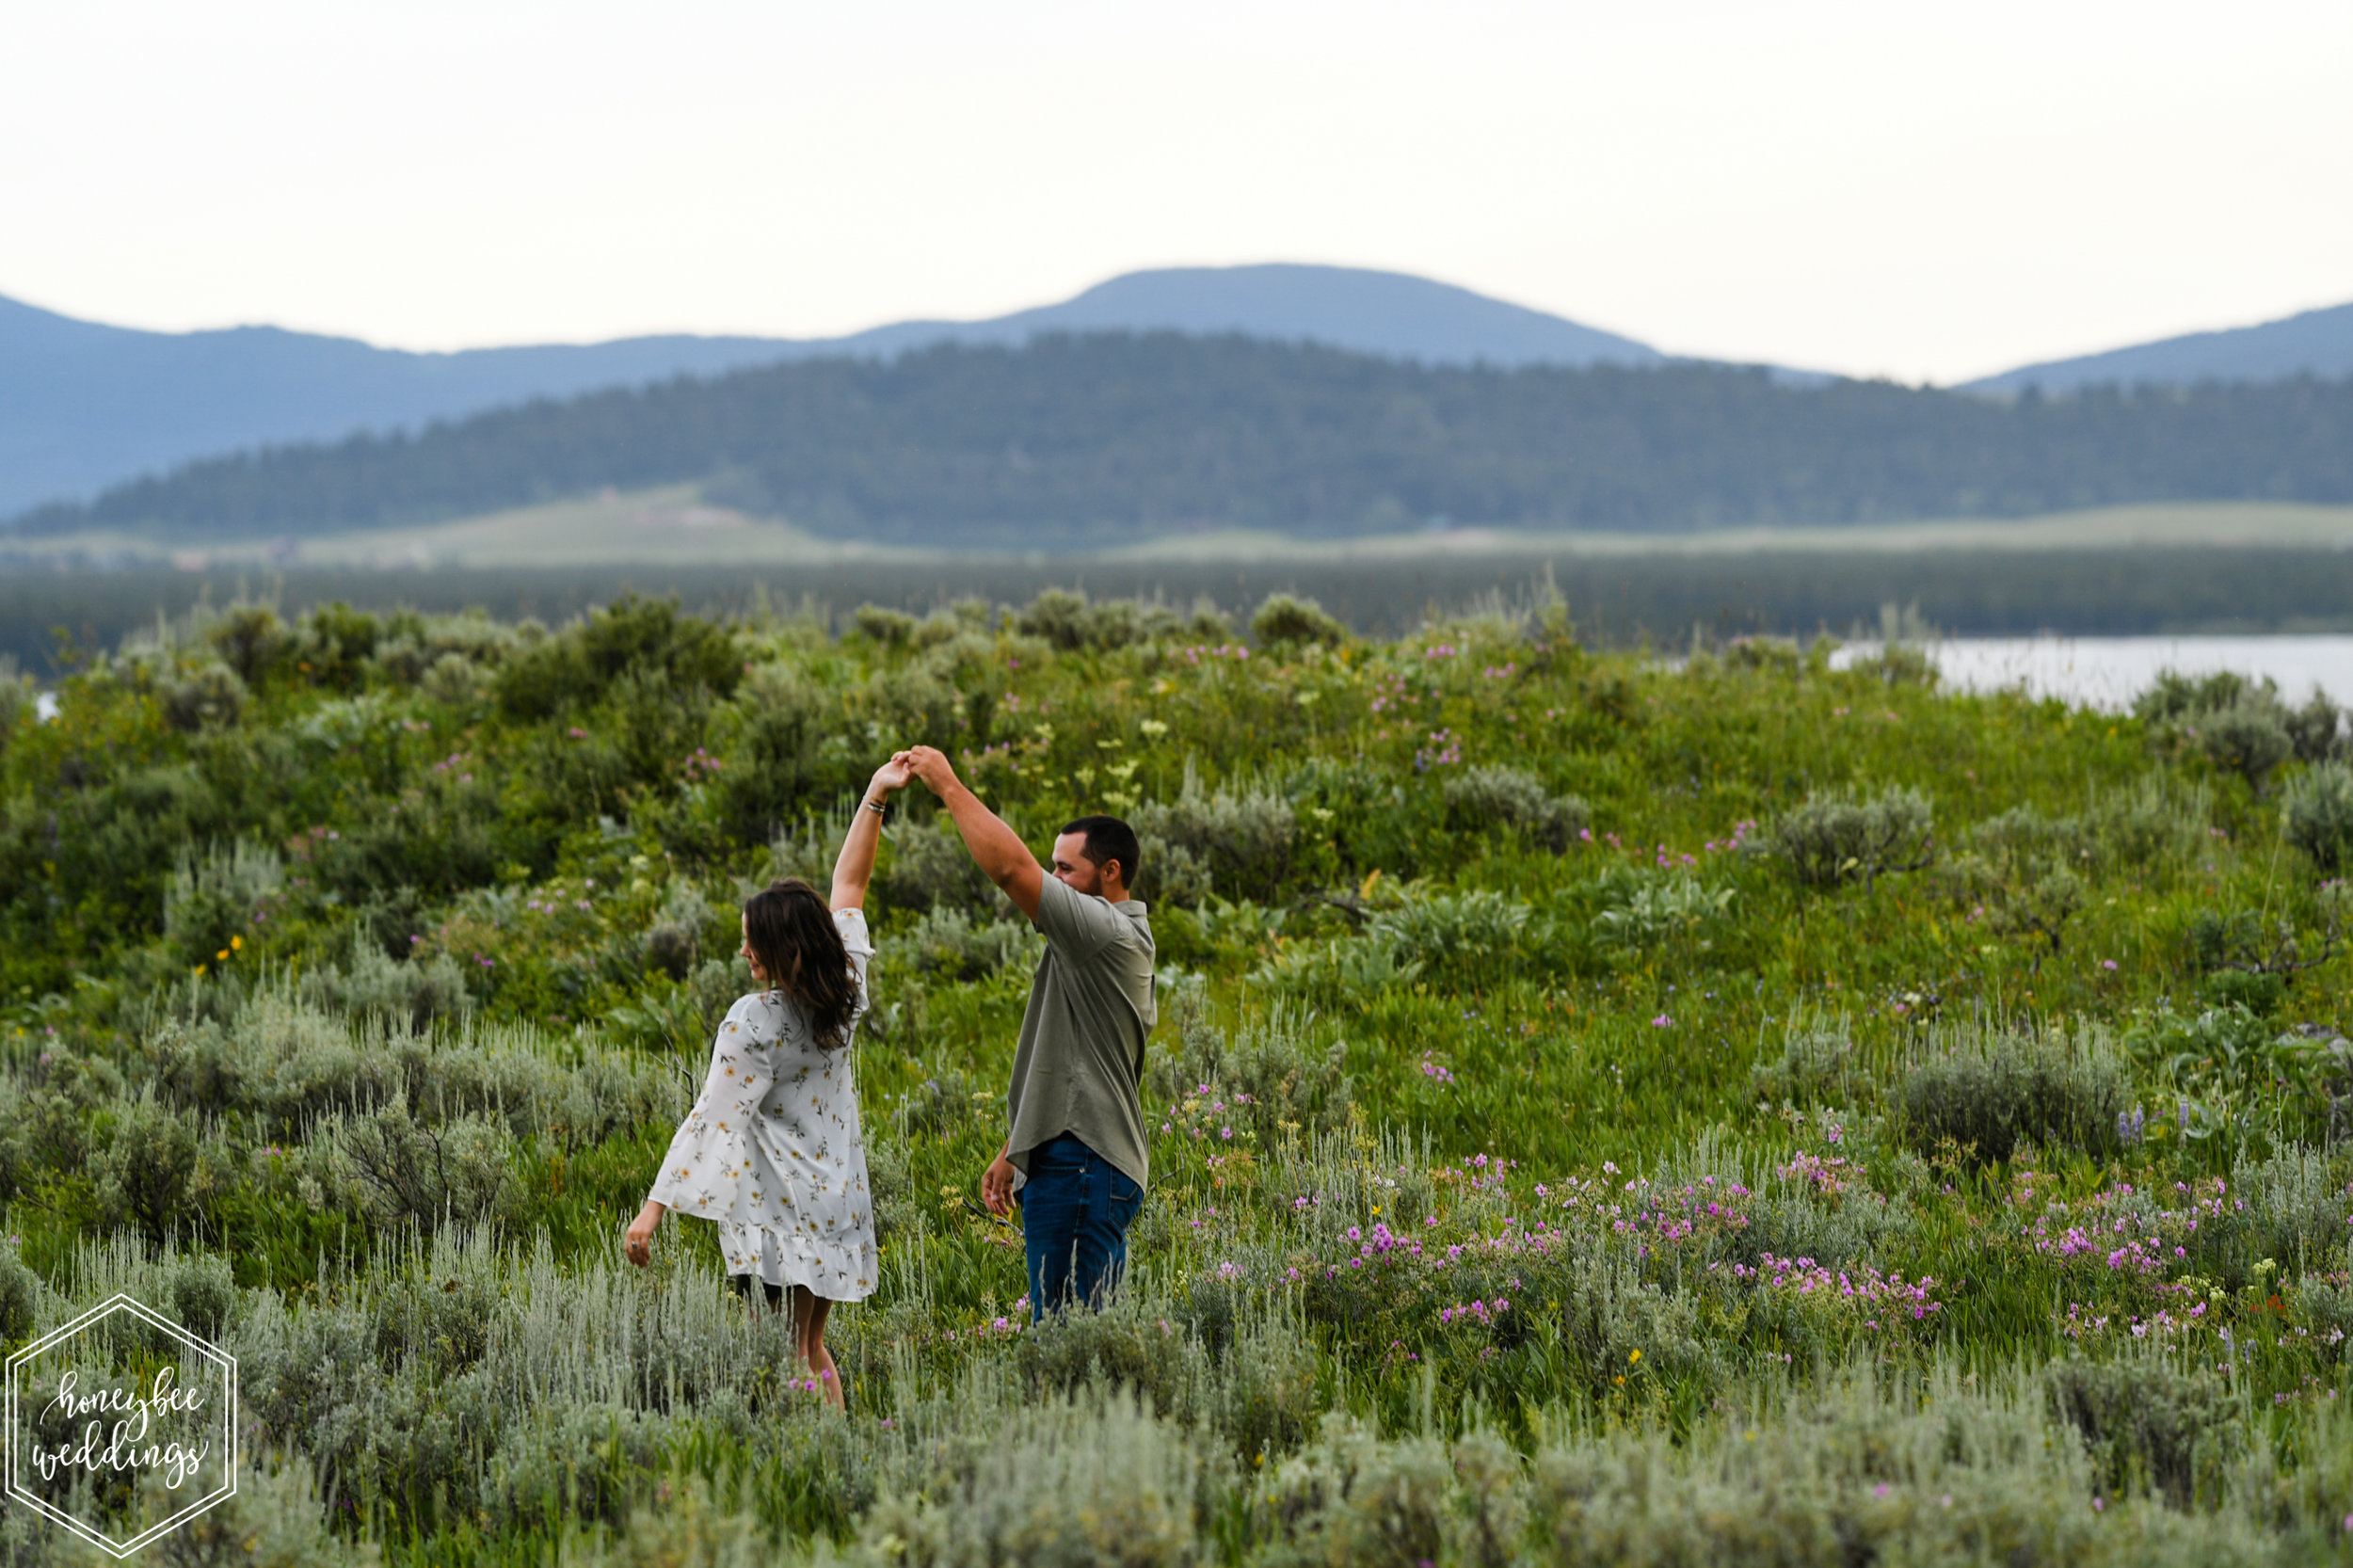 026Yellowstone National Park Wedding Photographer_Montana Engagement Session_Kelsie & DJ_July 24, 2019-55.jpg